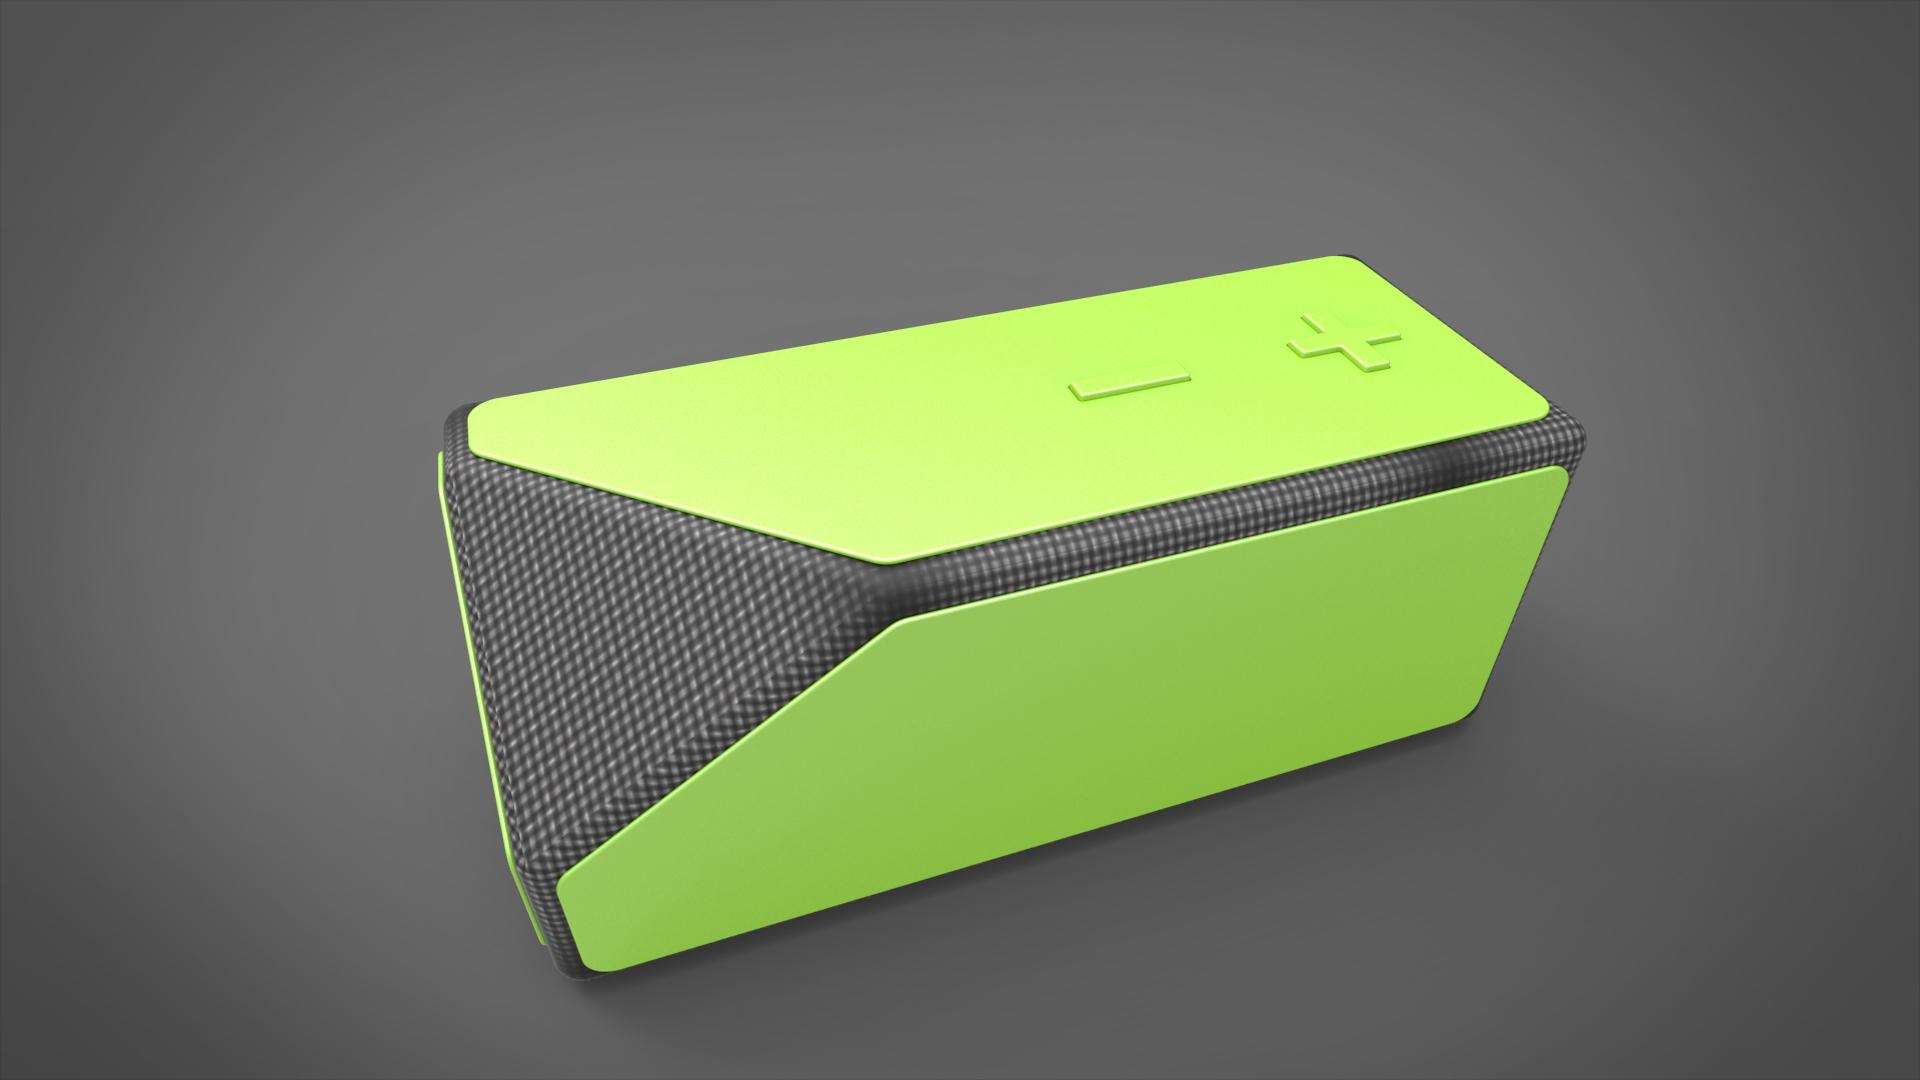 Cardboard Helicopter Product Design Cleveland Ohio Product Development Industrial Design - Waterproof Indoor Outdoor Bluetooth Speaker Electronics.jpg